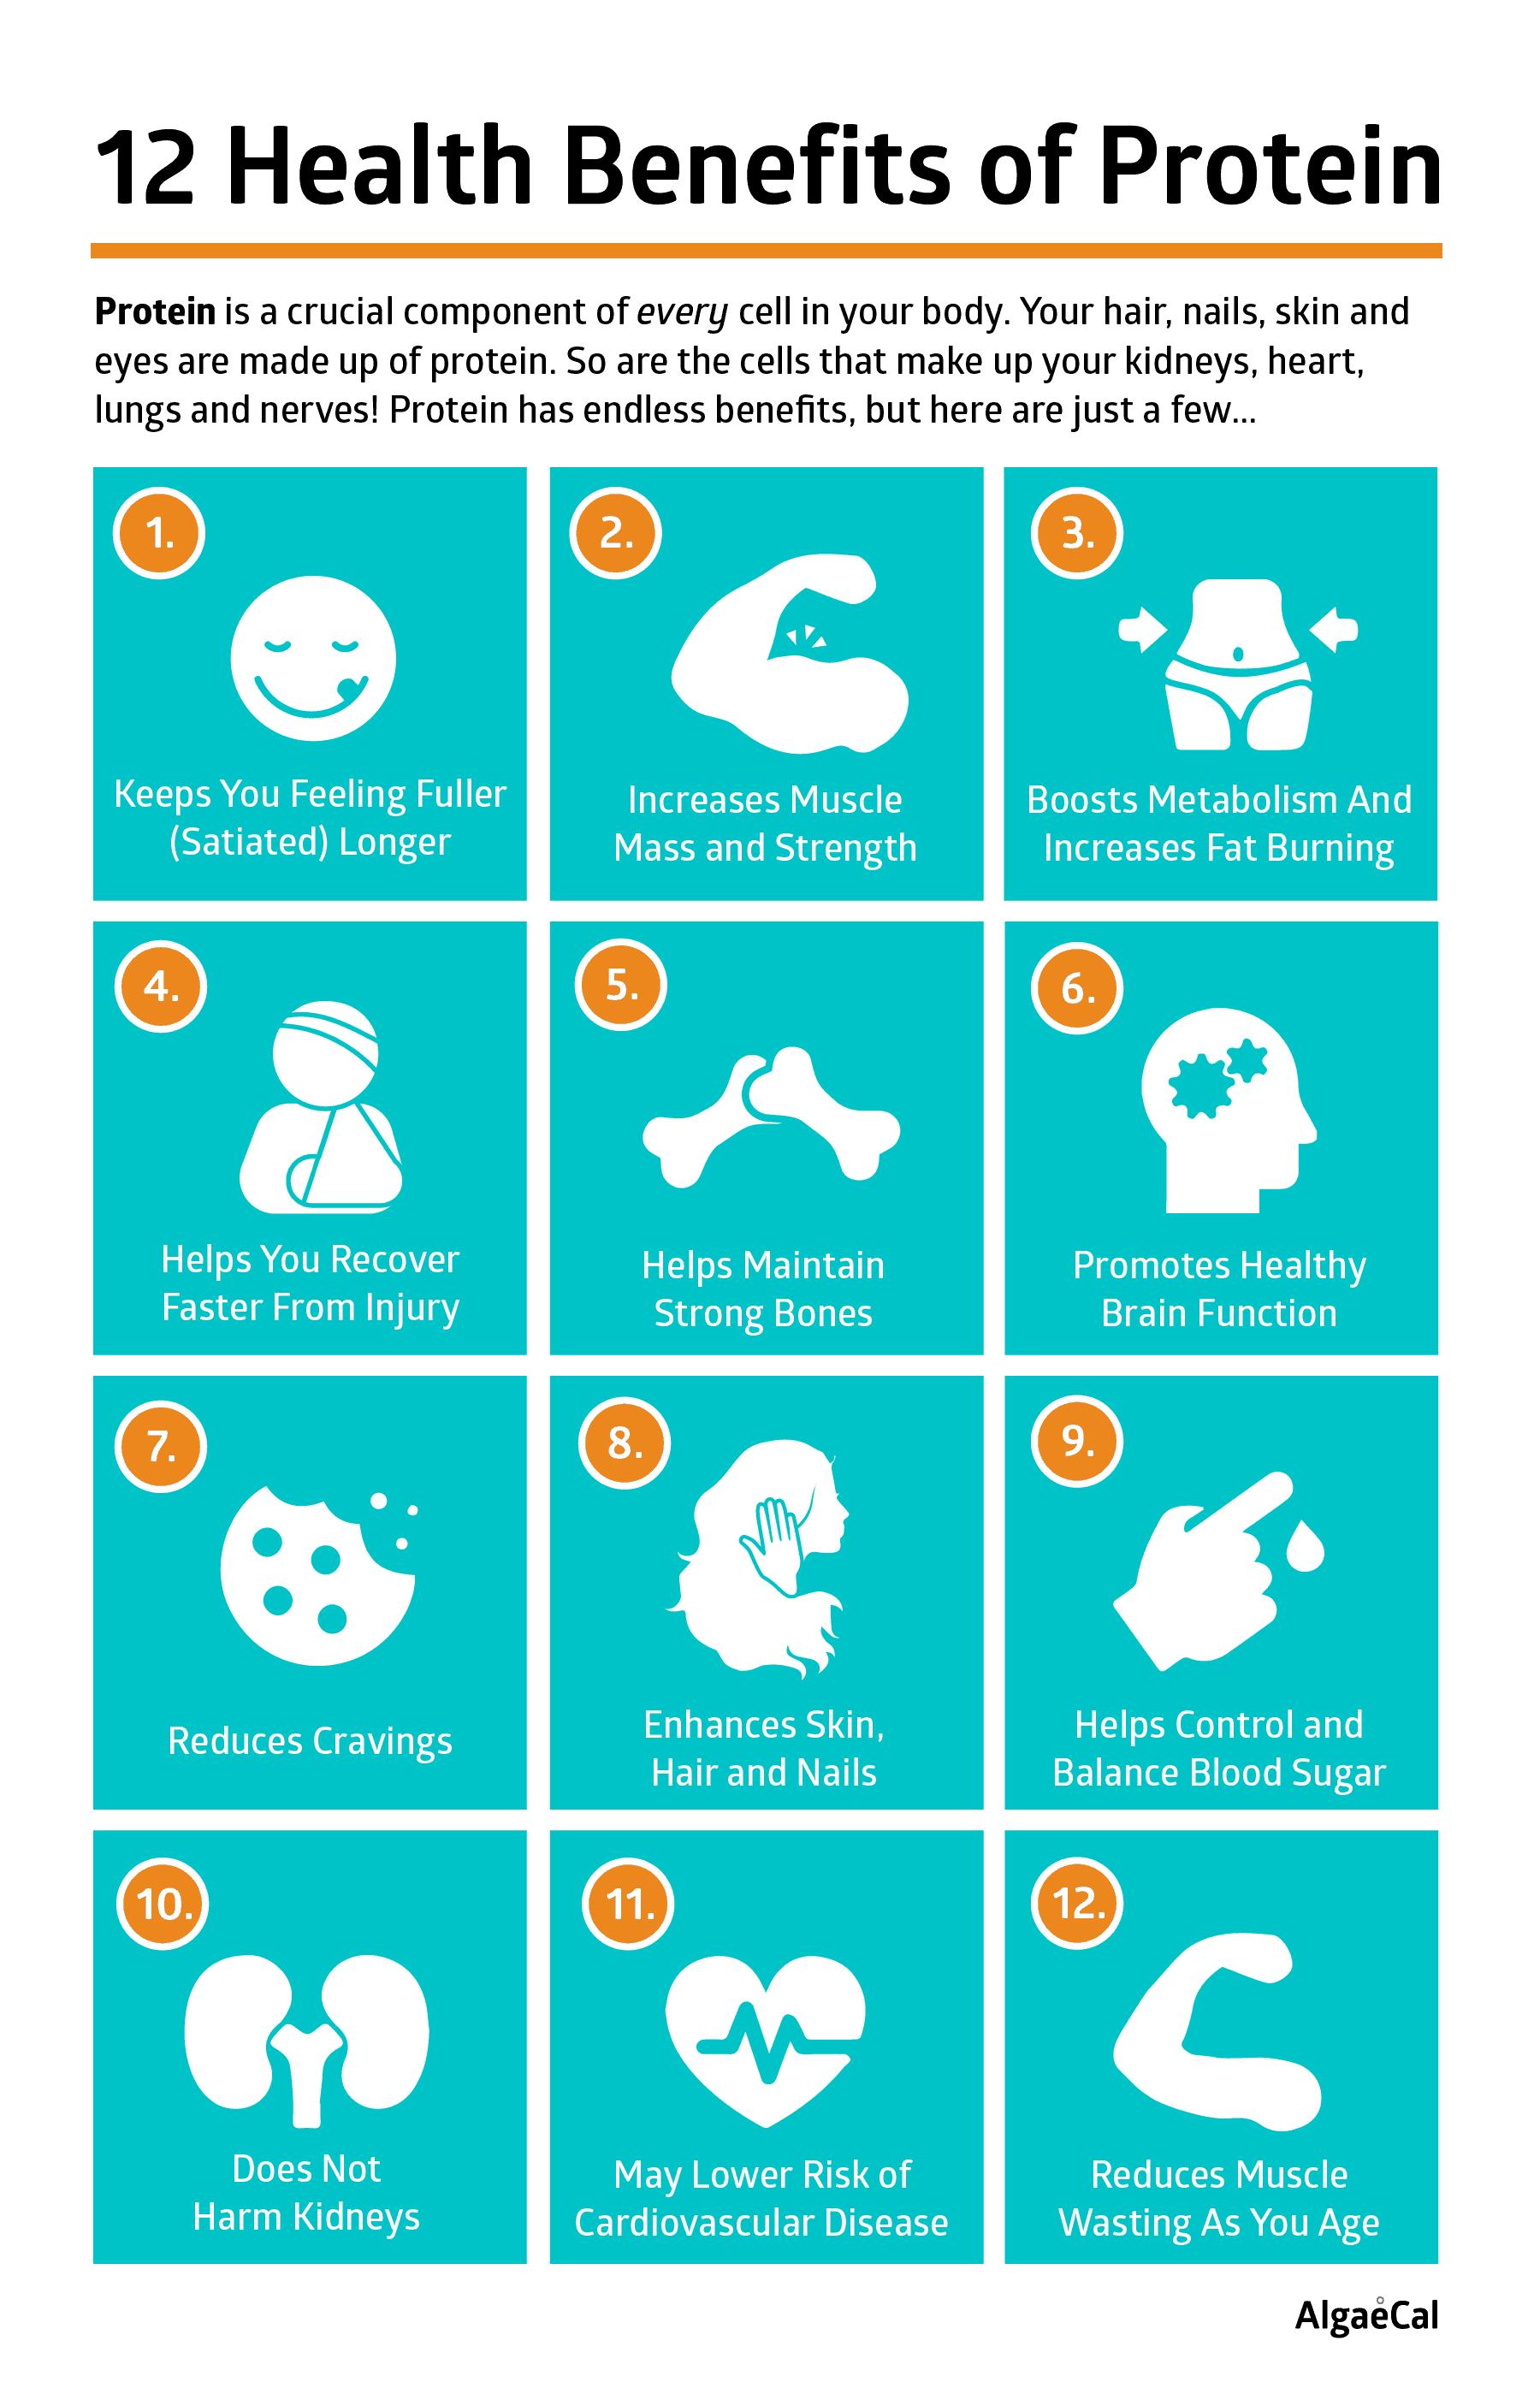 12 Health Benefits of Protein